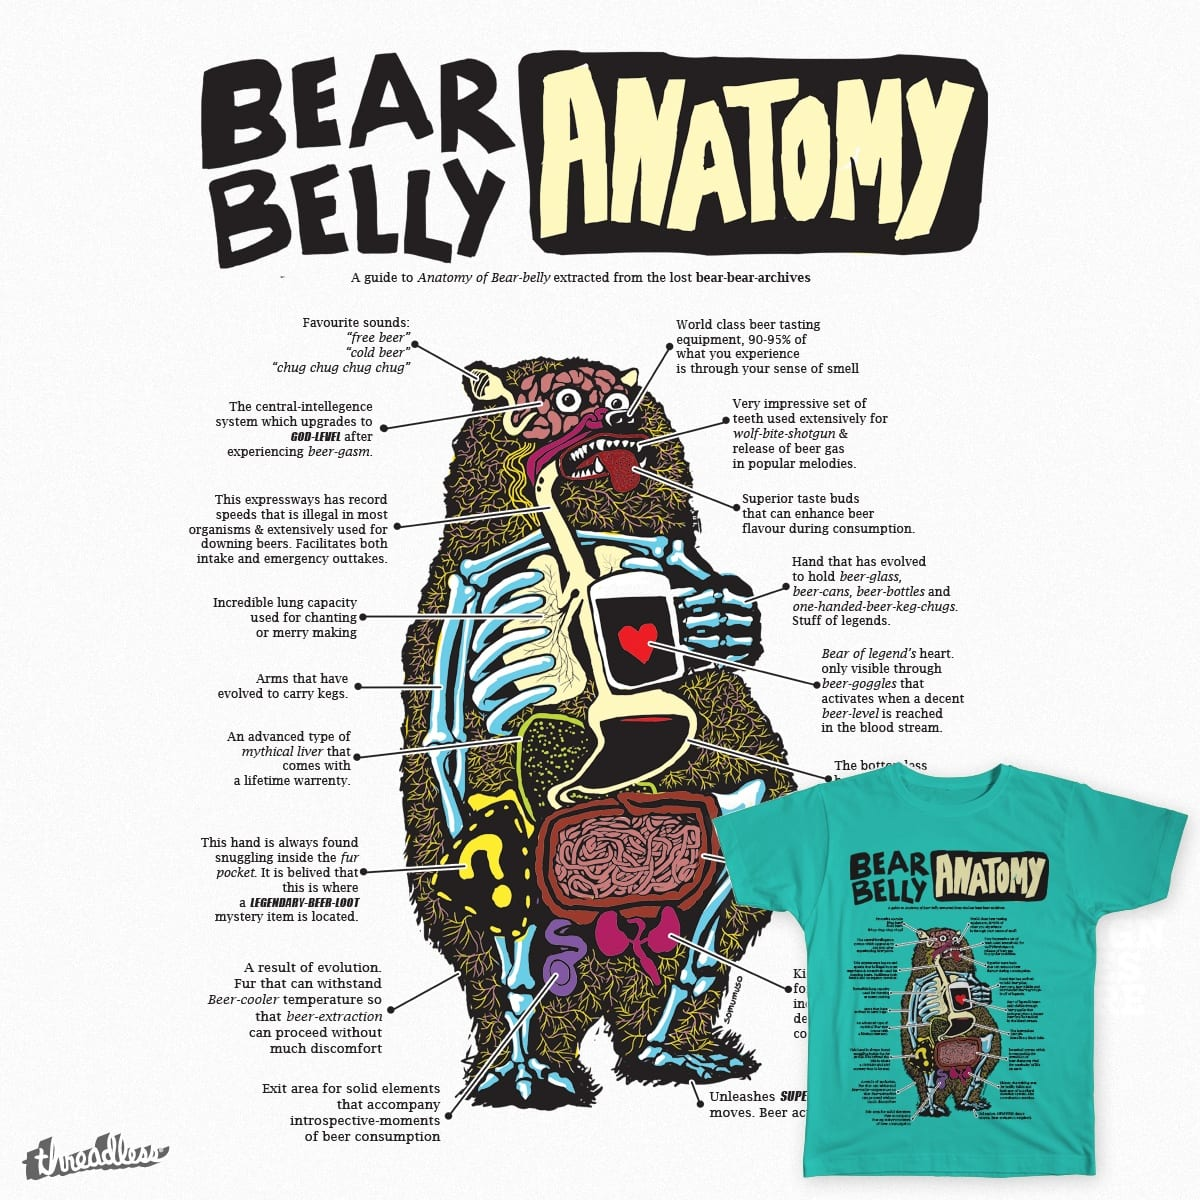 Score bear belly anatomy by somumuso on Threadless